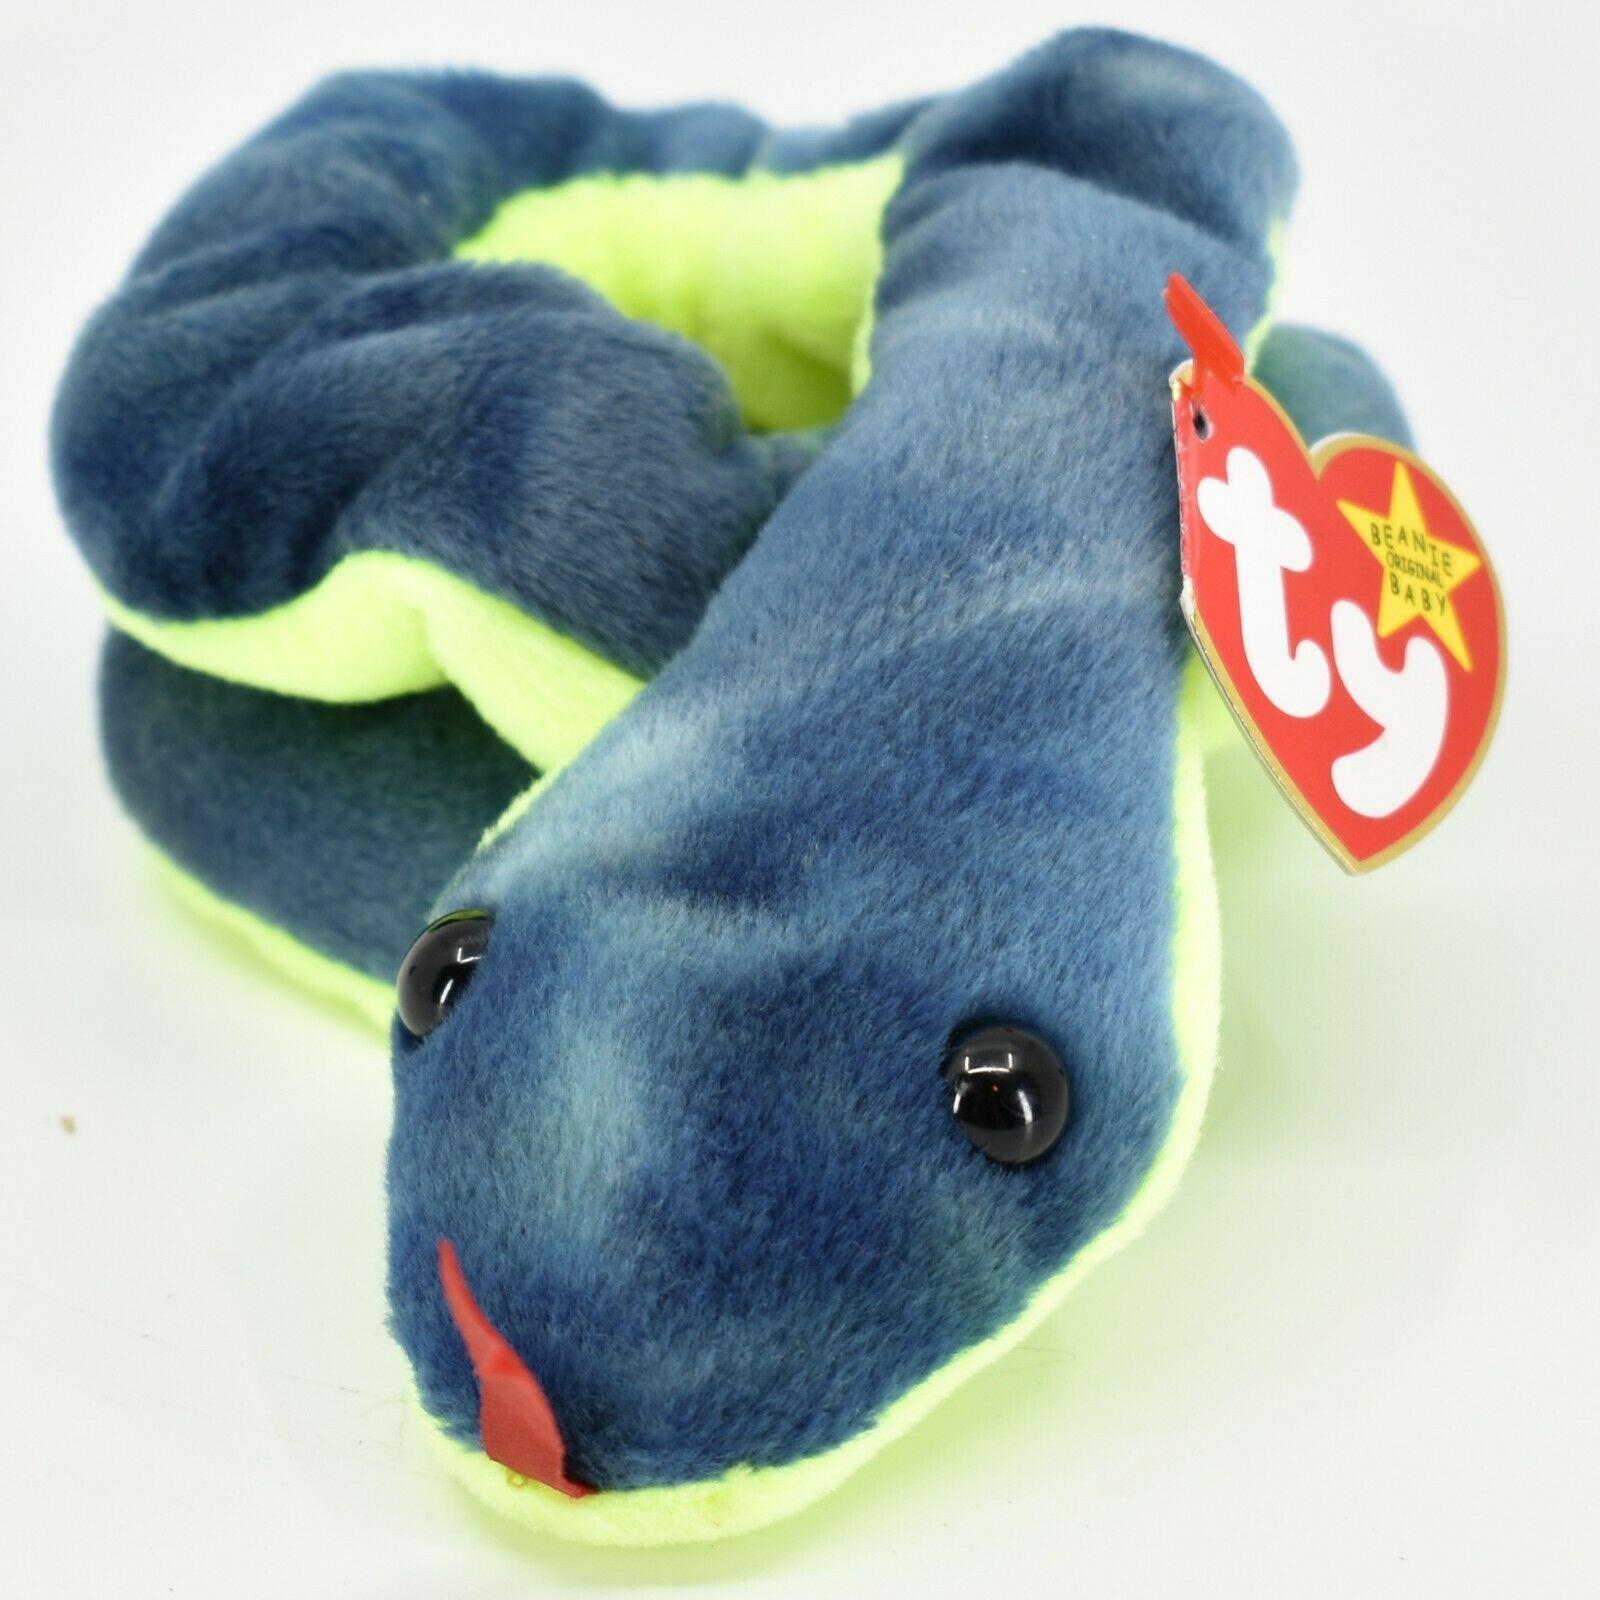 1997 TY Beanie Baby Original Hissy the Snake Retired Beanbag Plush Toy